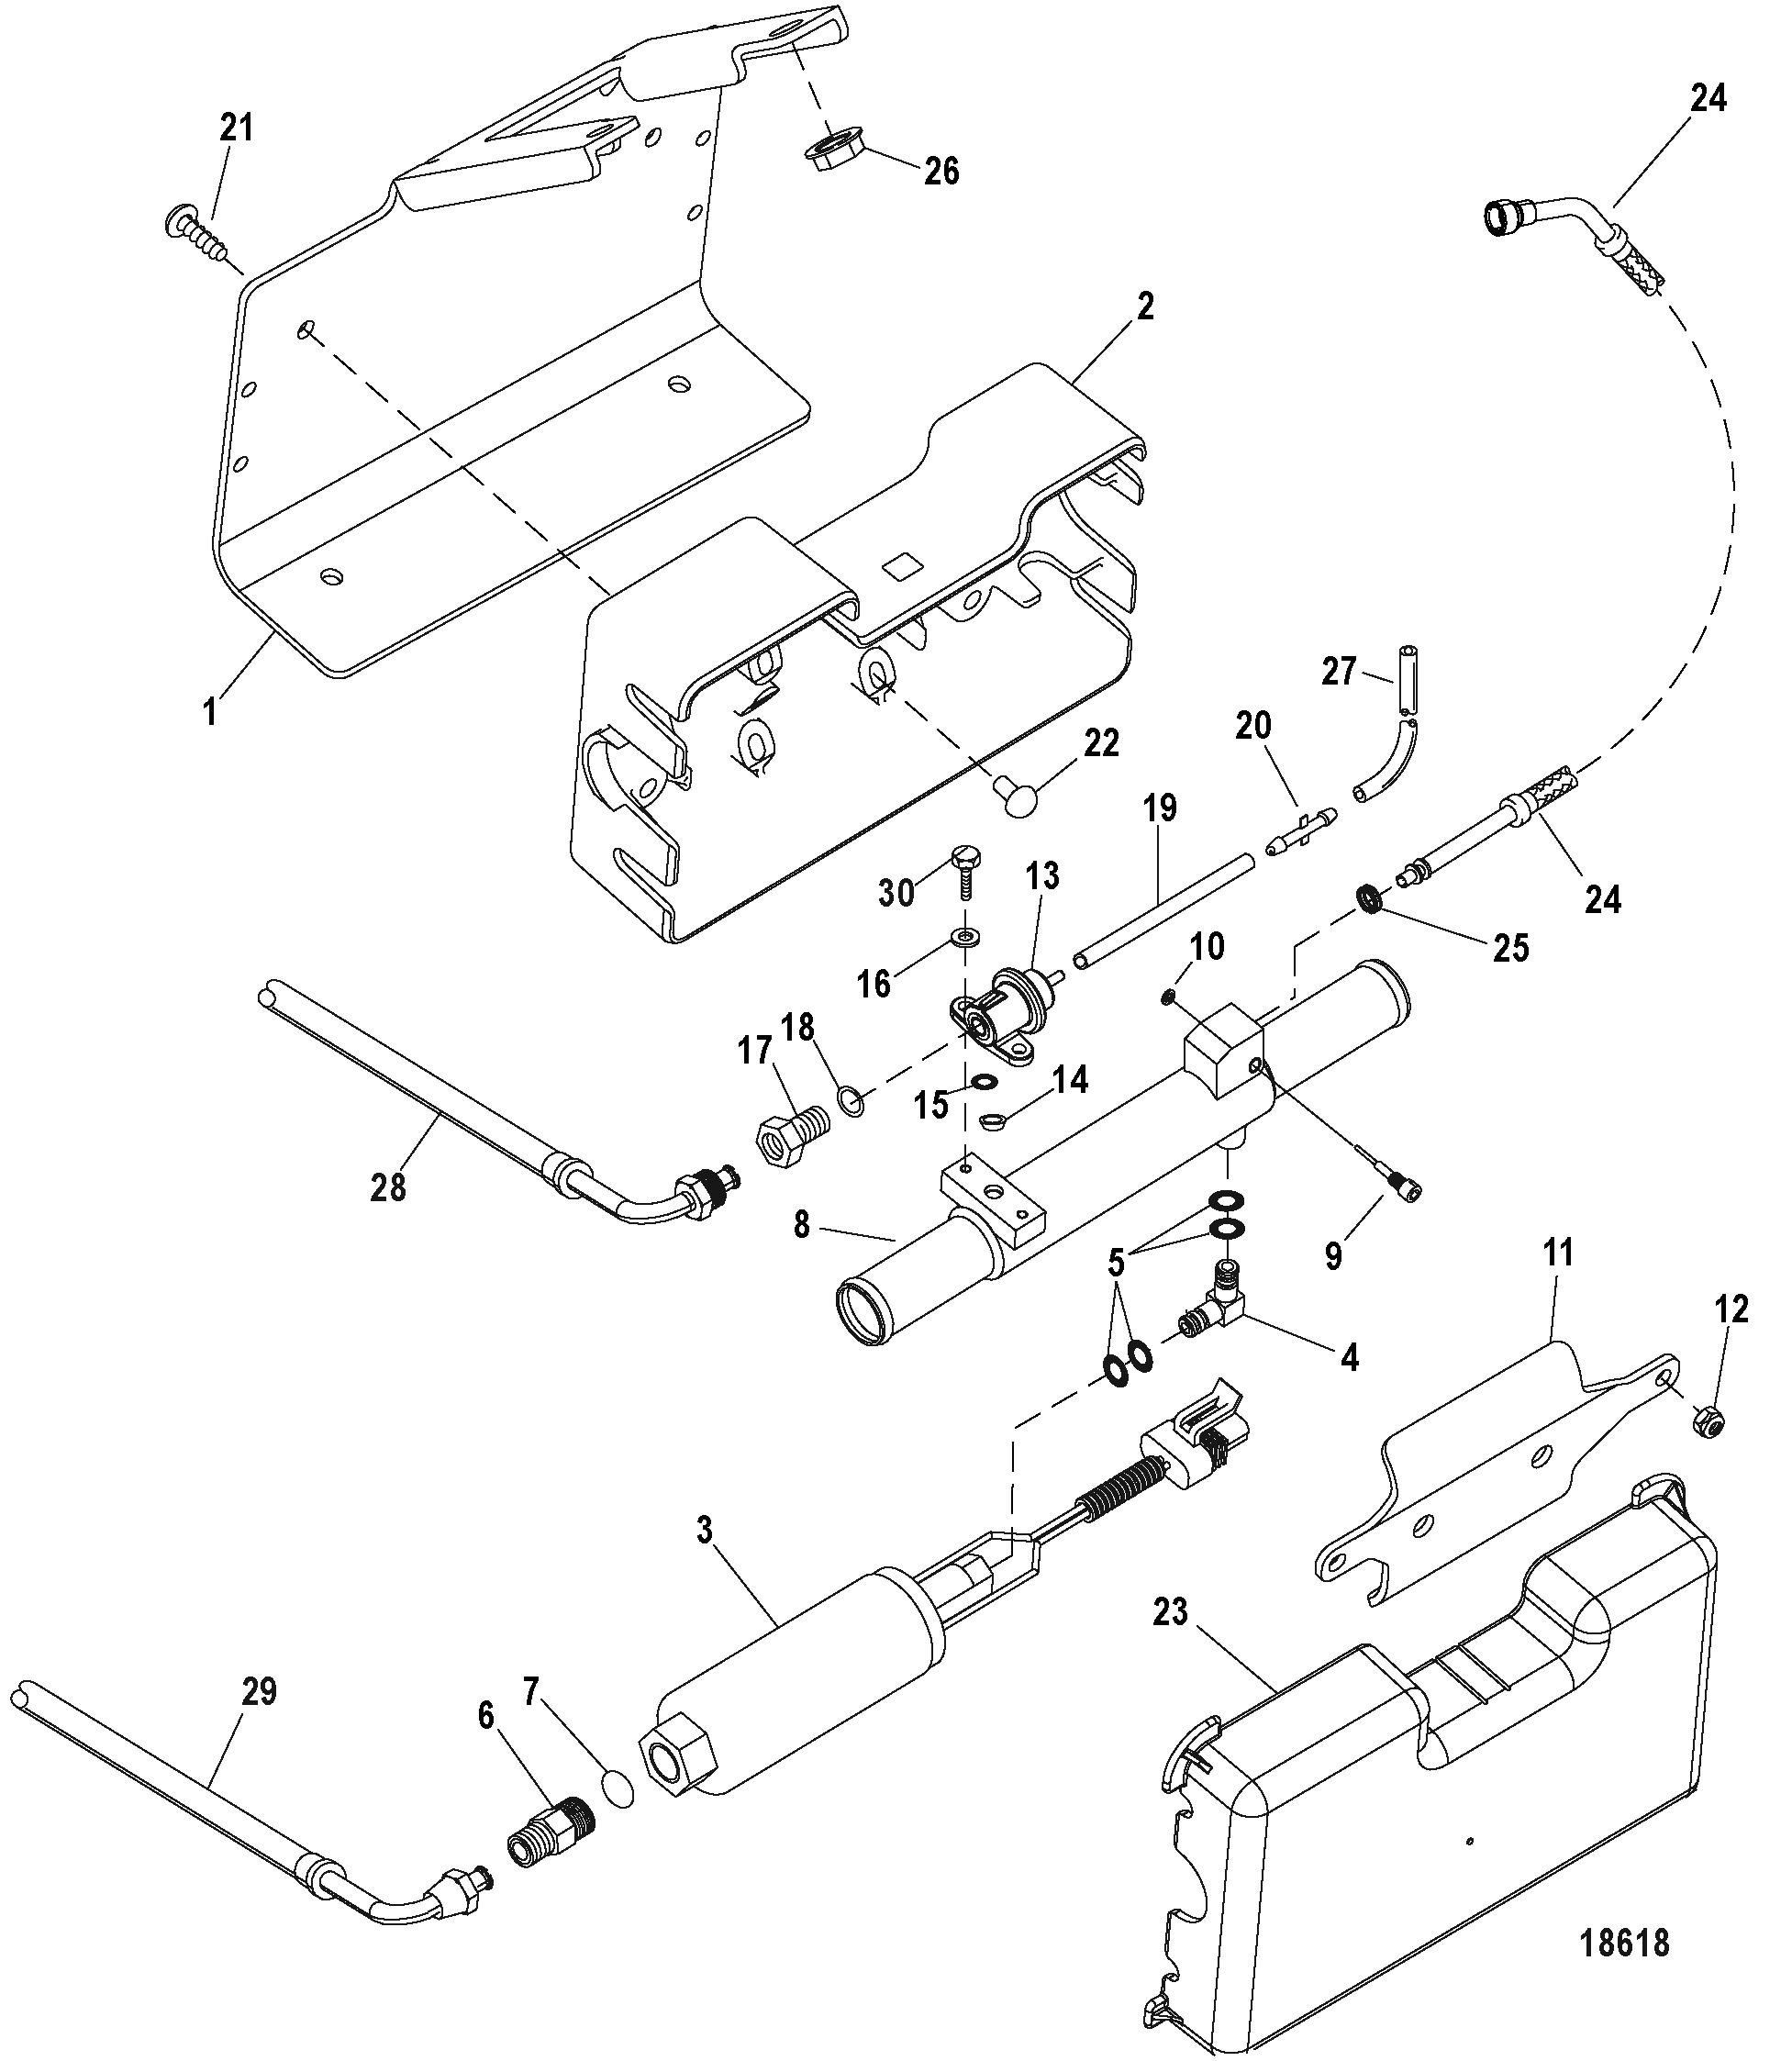 hight resolution of 1987 mercruiser 350 ignition wiring diagram